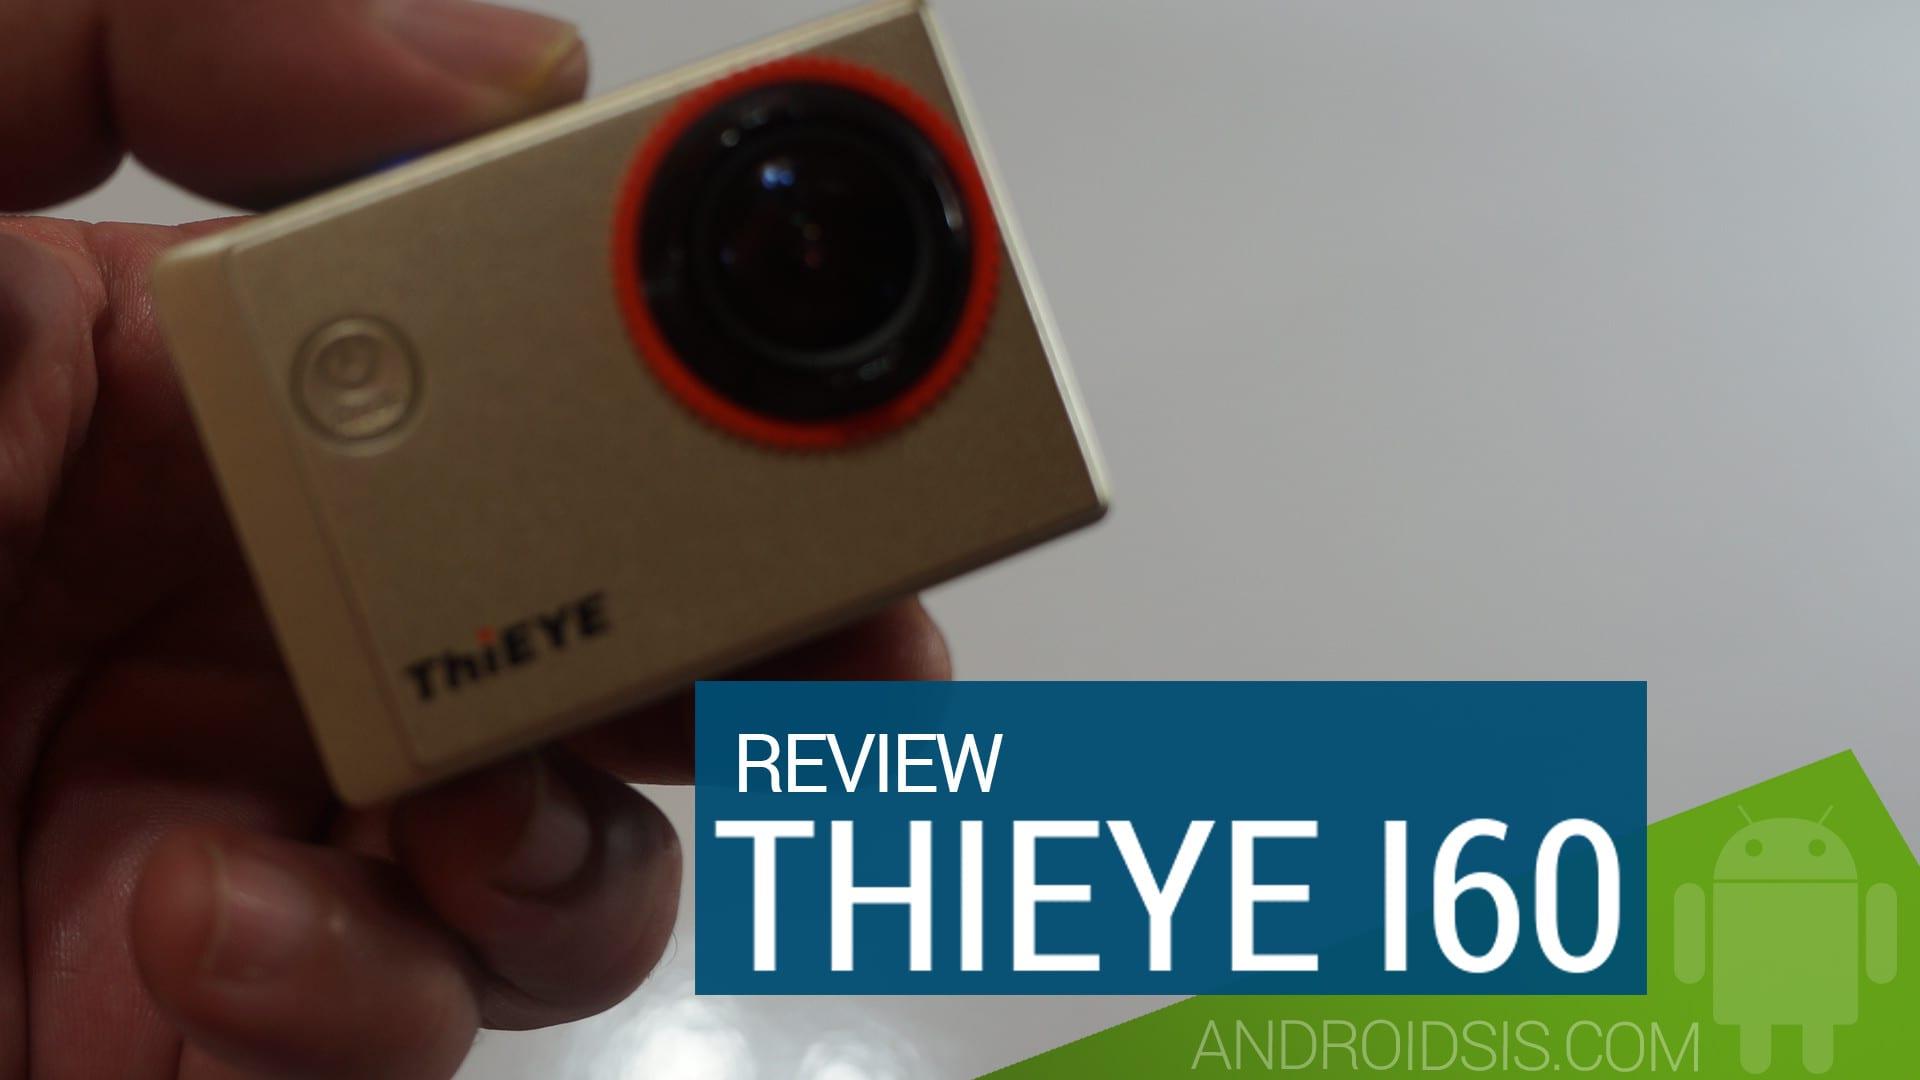 Review en español de la Thieye i60 4K